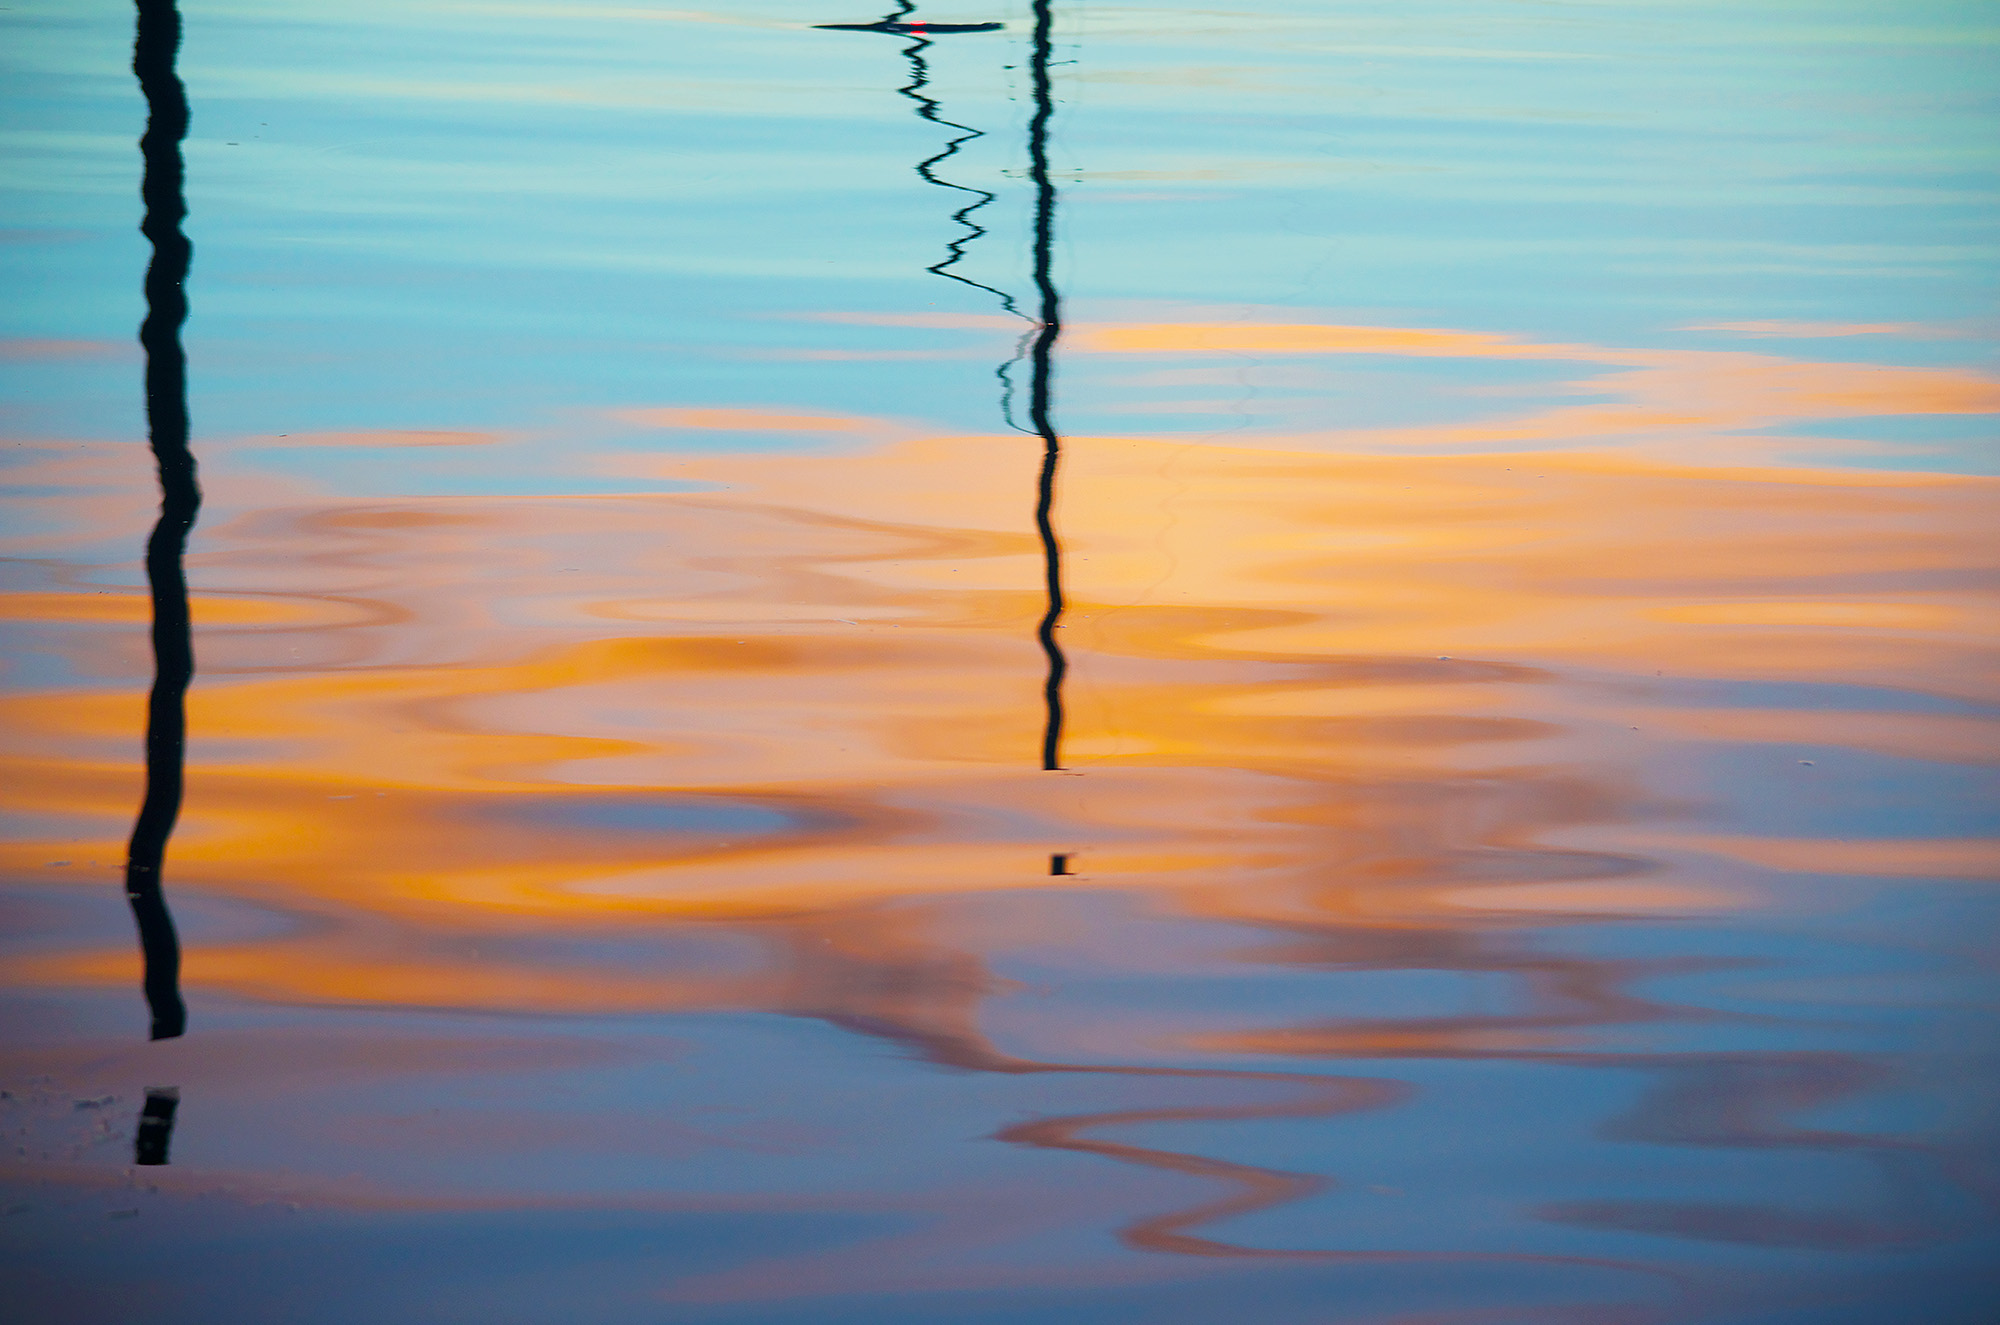 Bay Reflections